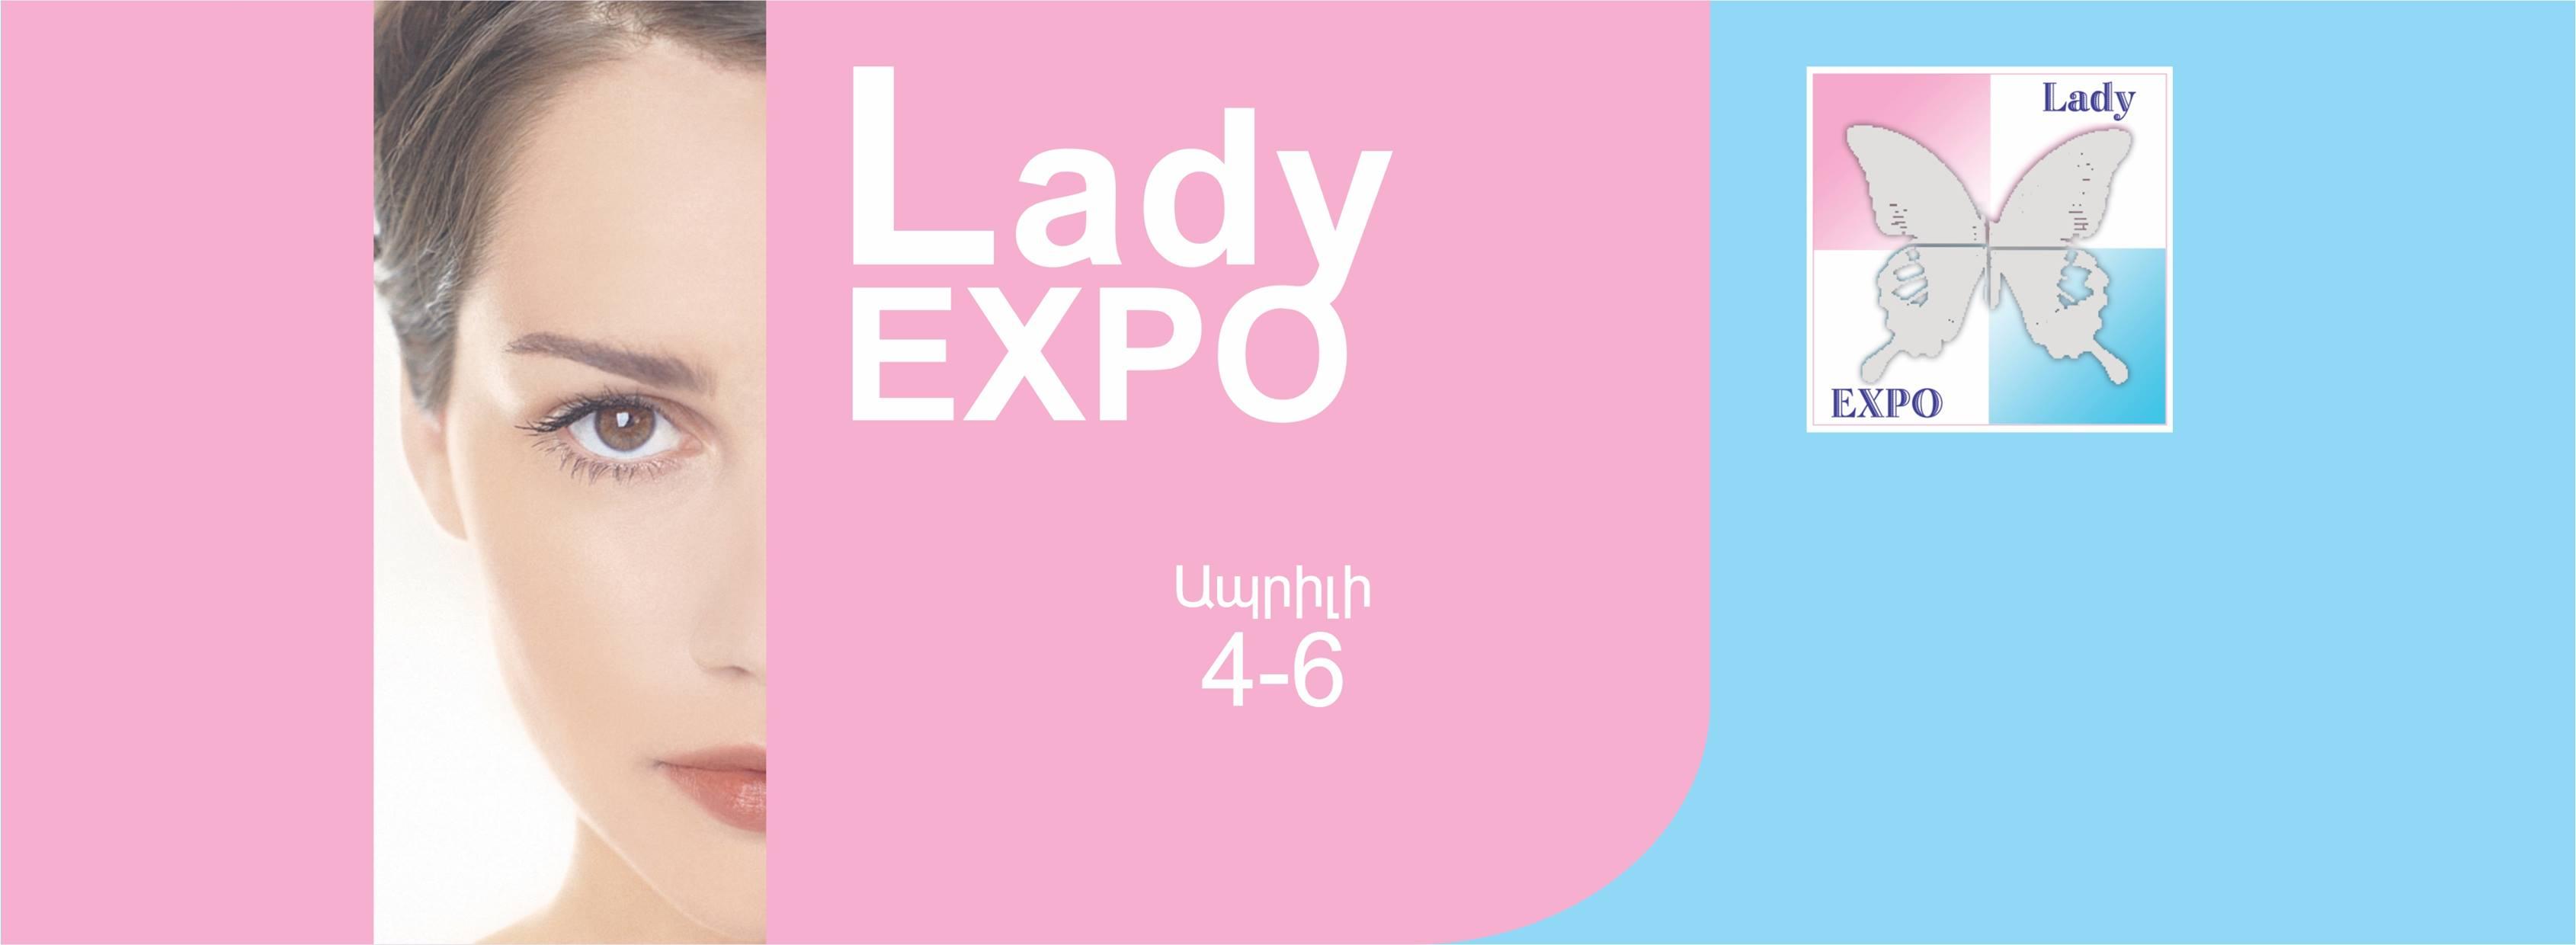 Lady EXPO 2020